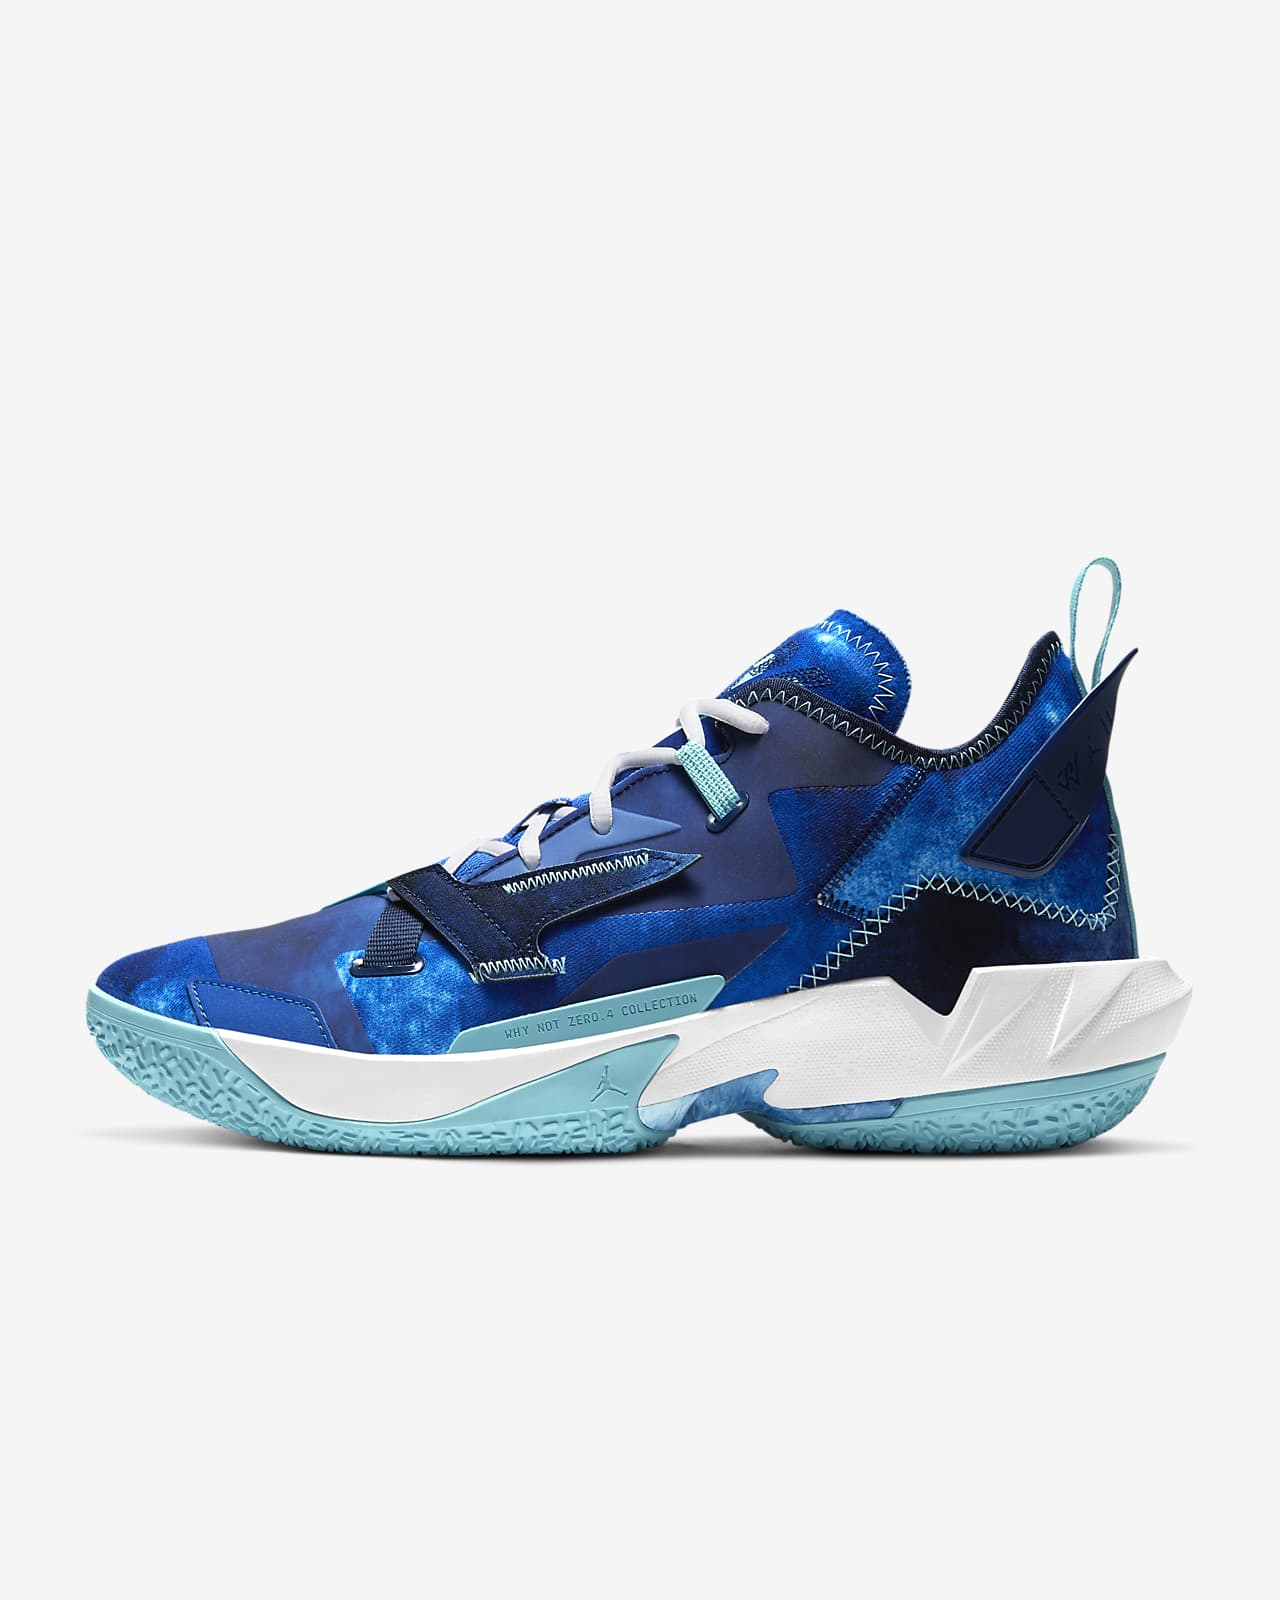 Jordan 'Why Not?' Zer0.4 'Trust & Loyalty' Basketball Shoe